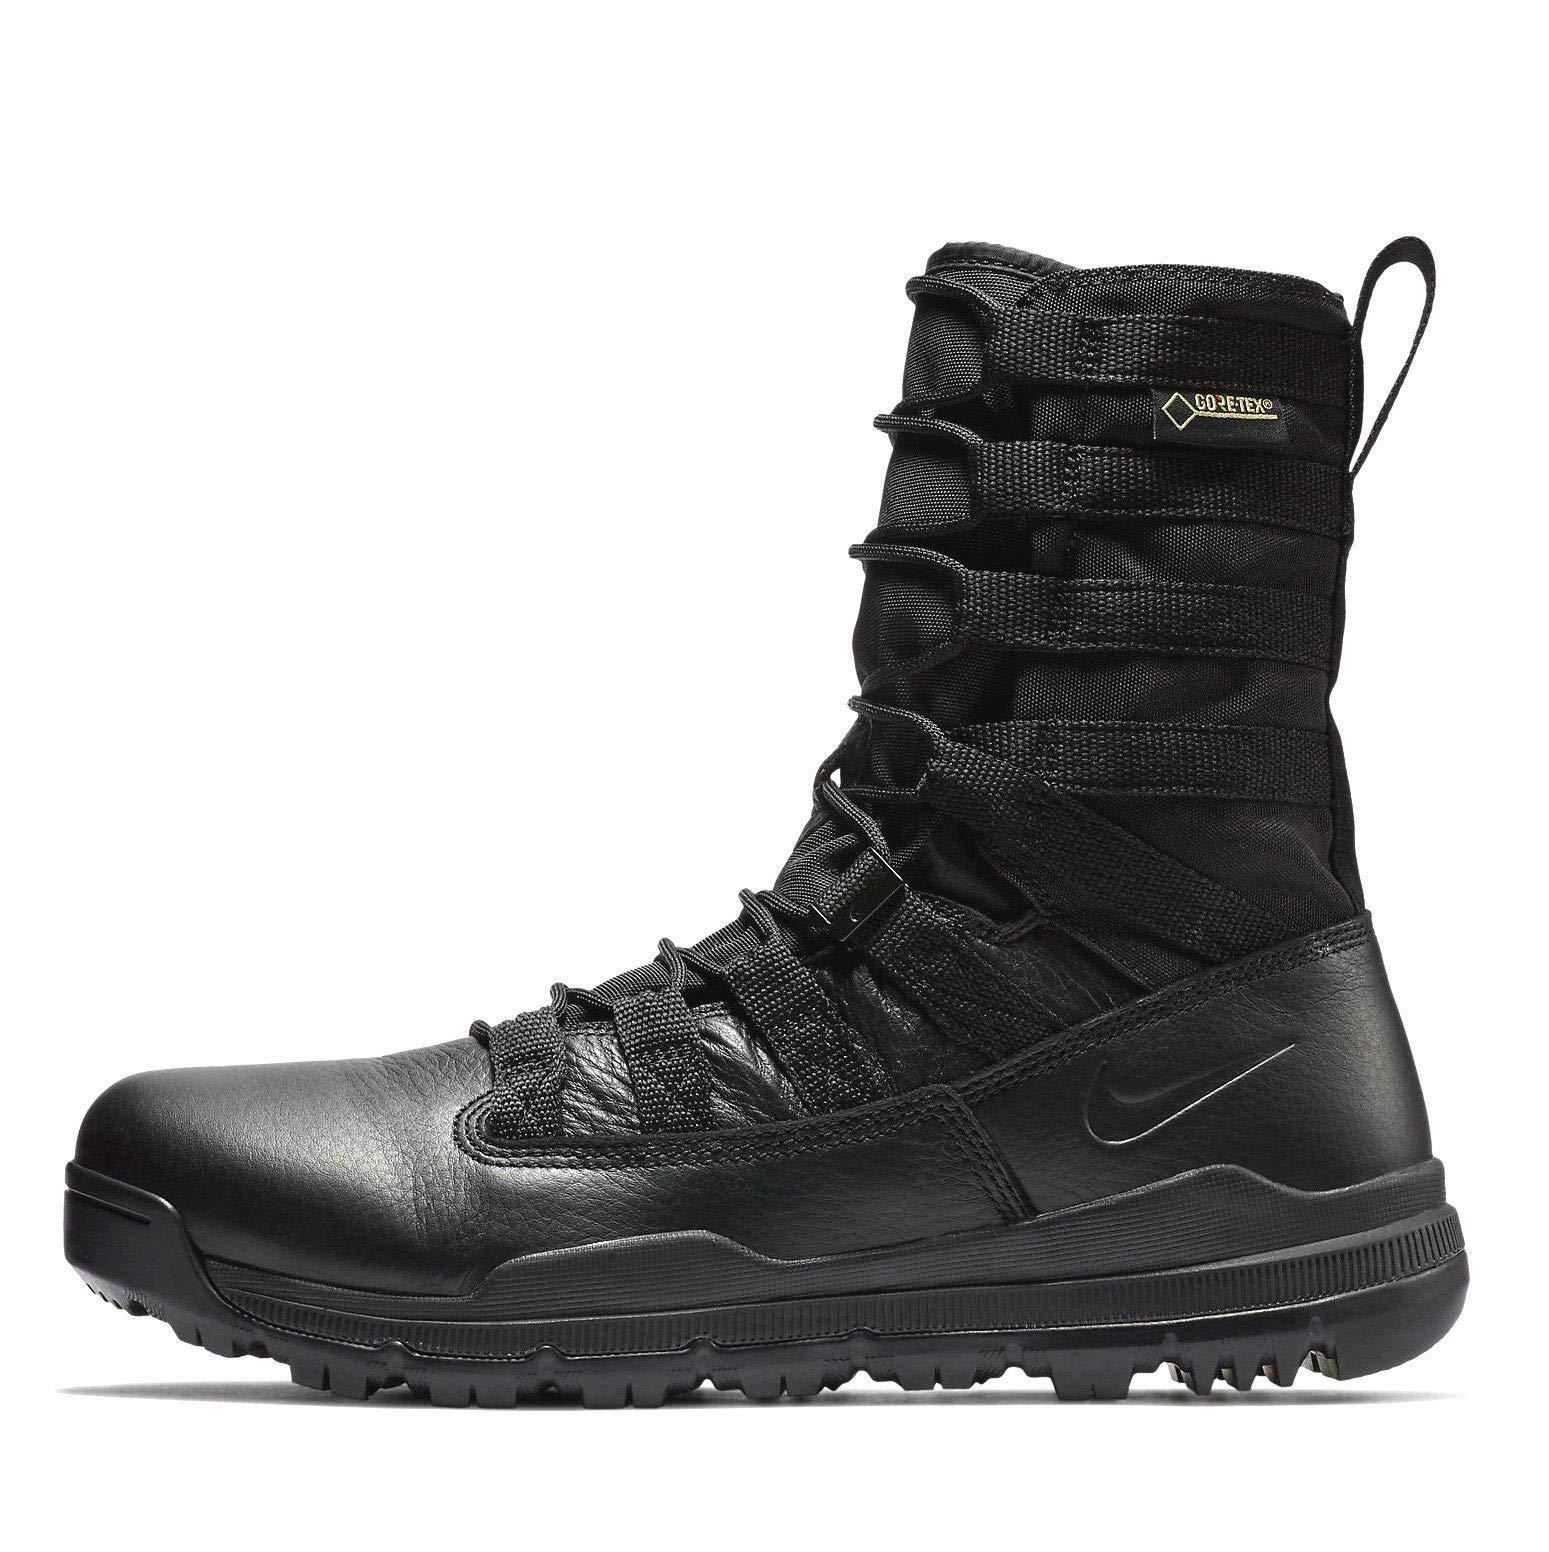 Nike SFB Gen 2 8'' GTX Black/Black 8.5